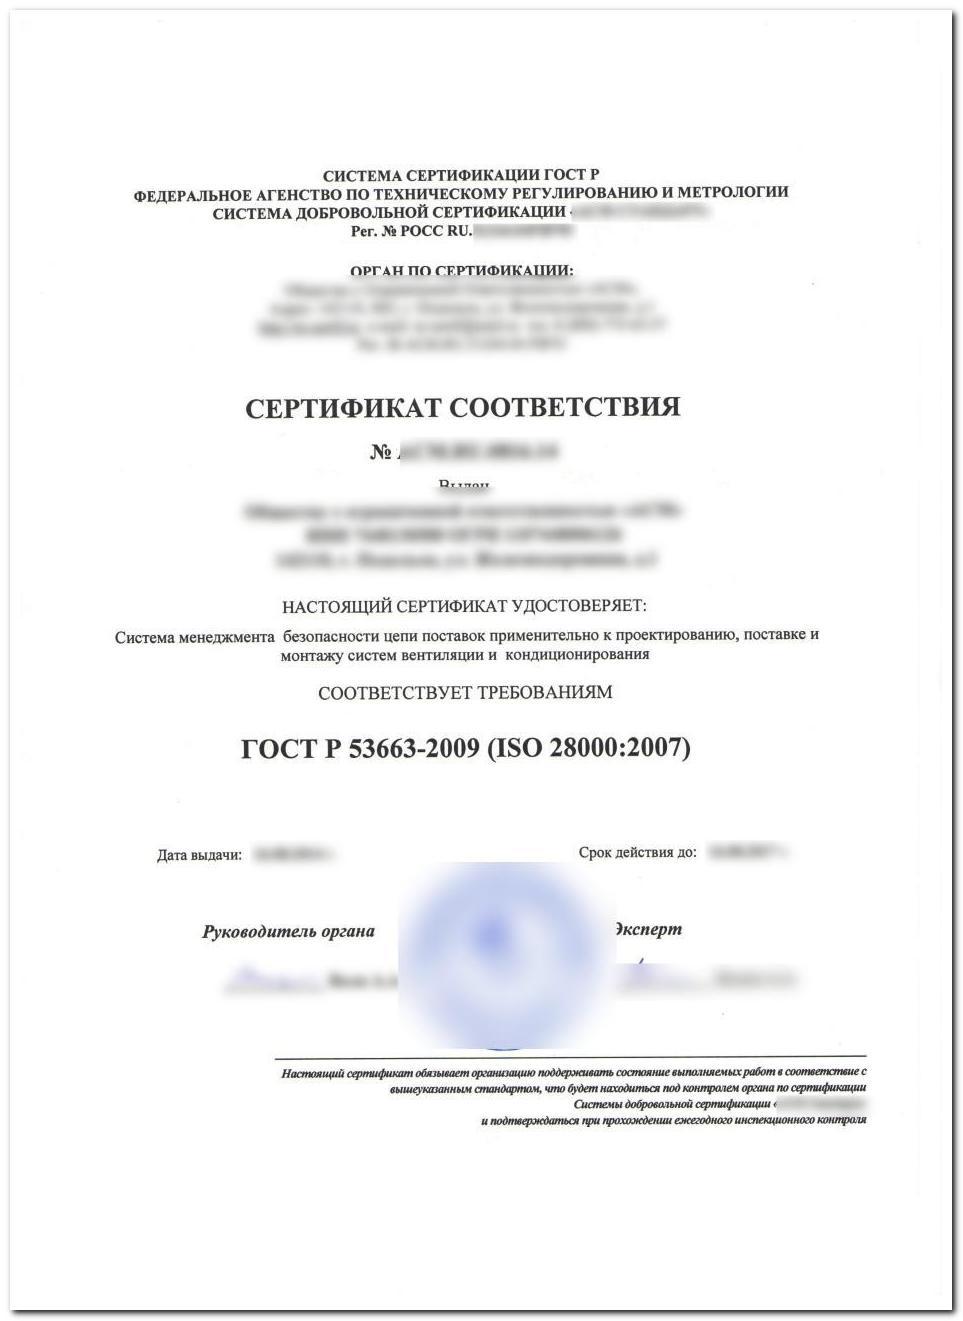 образец сертификата исо 28000